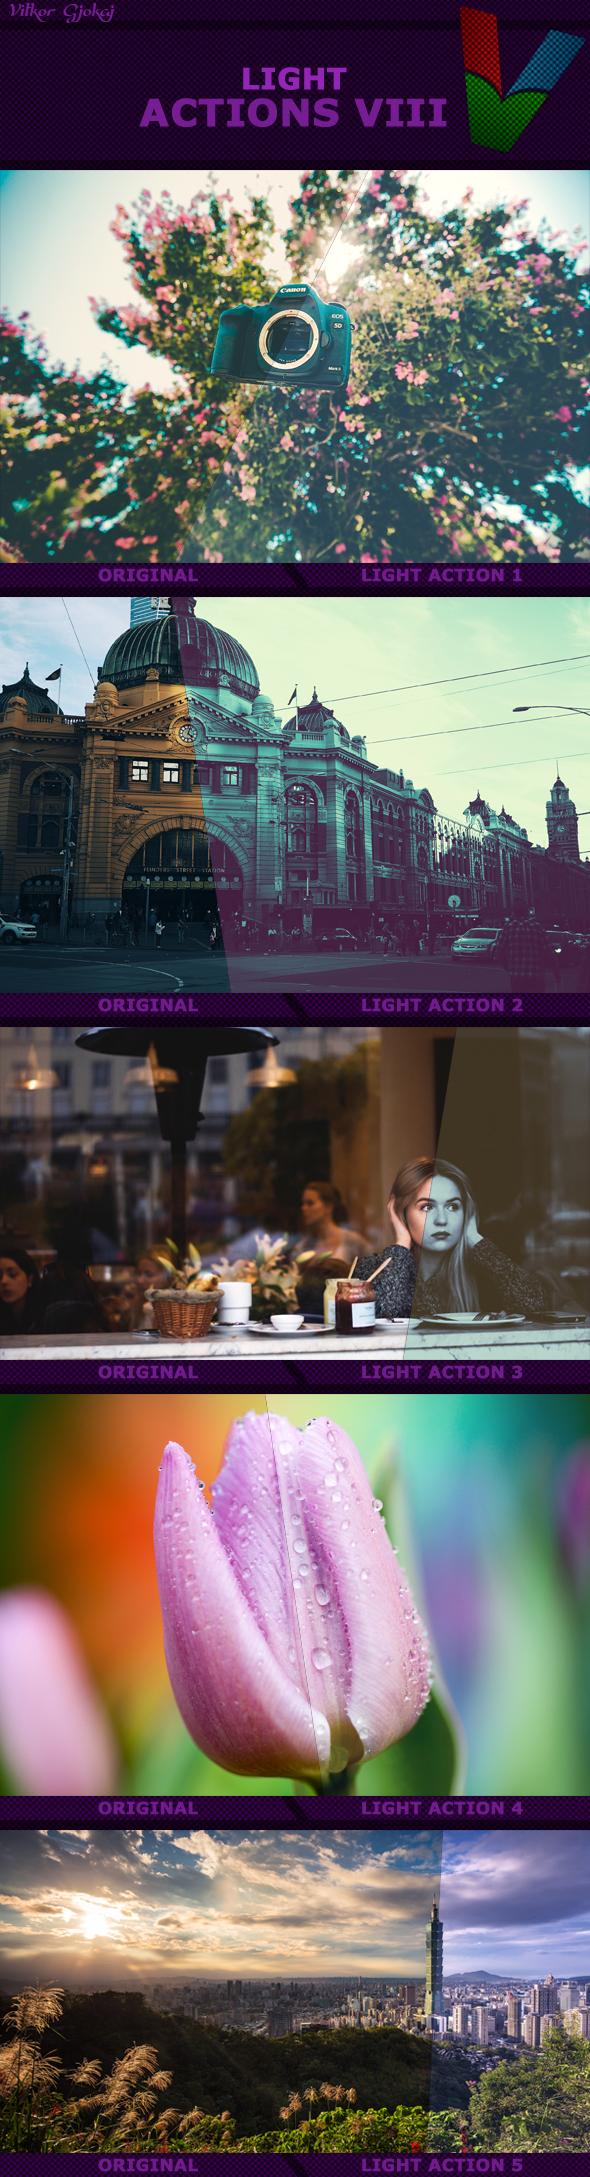 Light Actions VIII